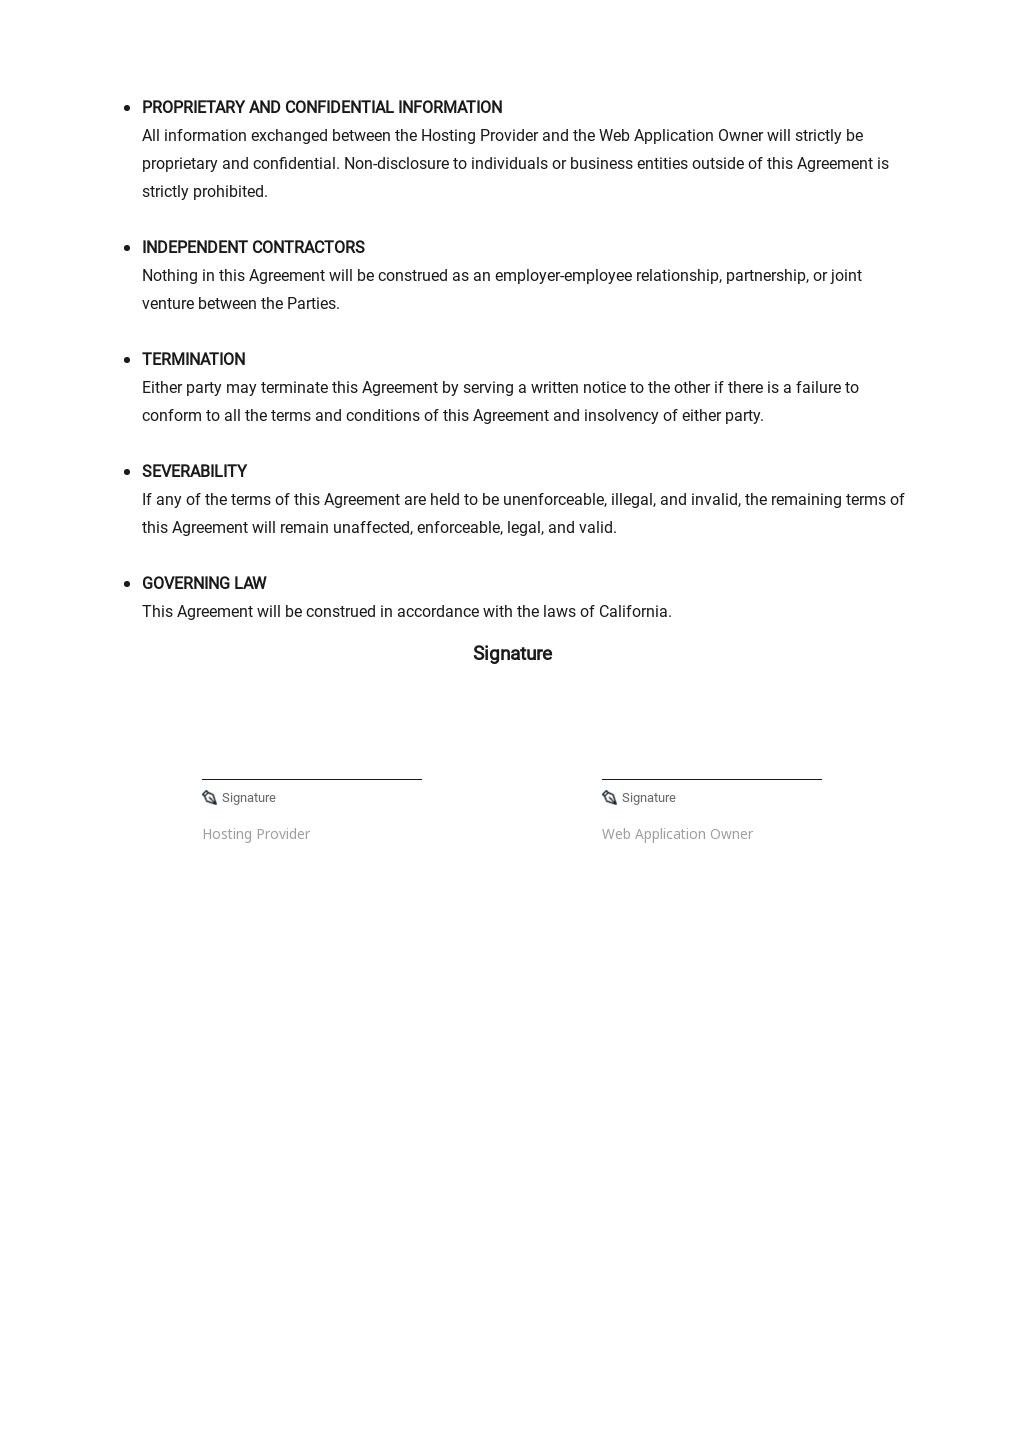 Website Hosting Agreement Template 2.jpe